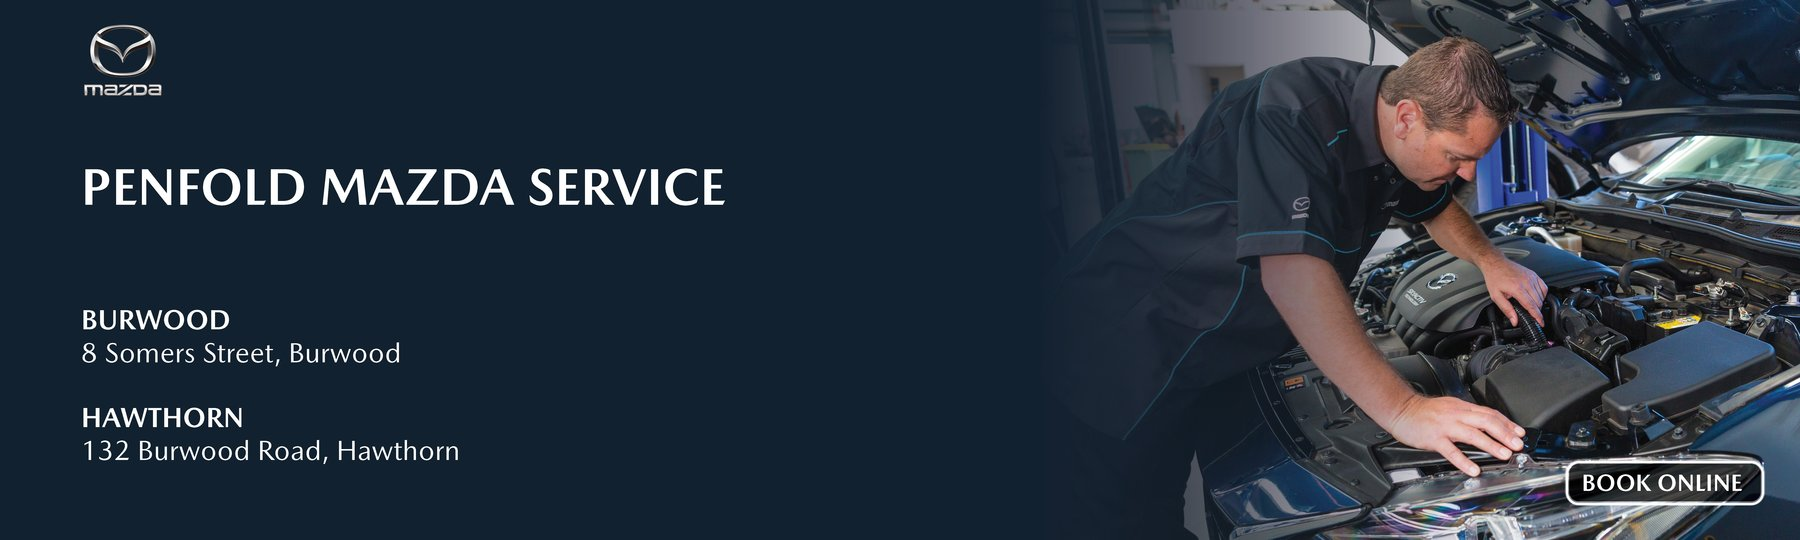 Penfold Mazda Burwood Service Centre